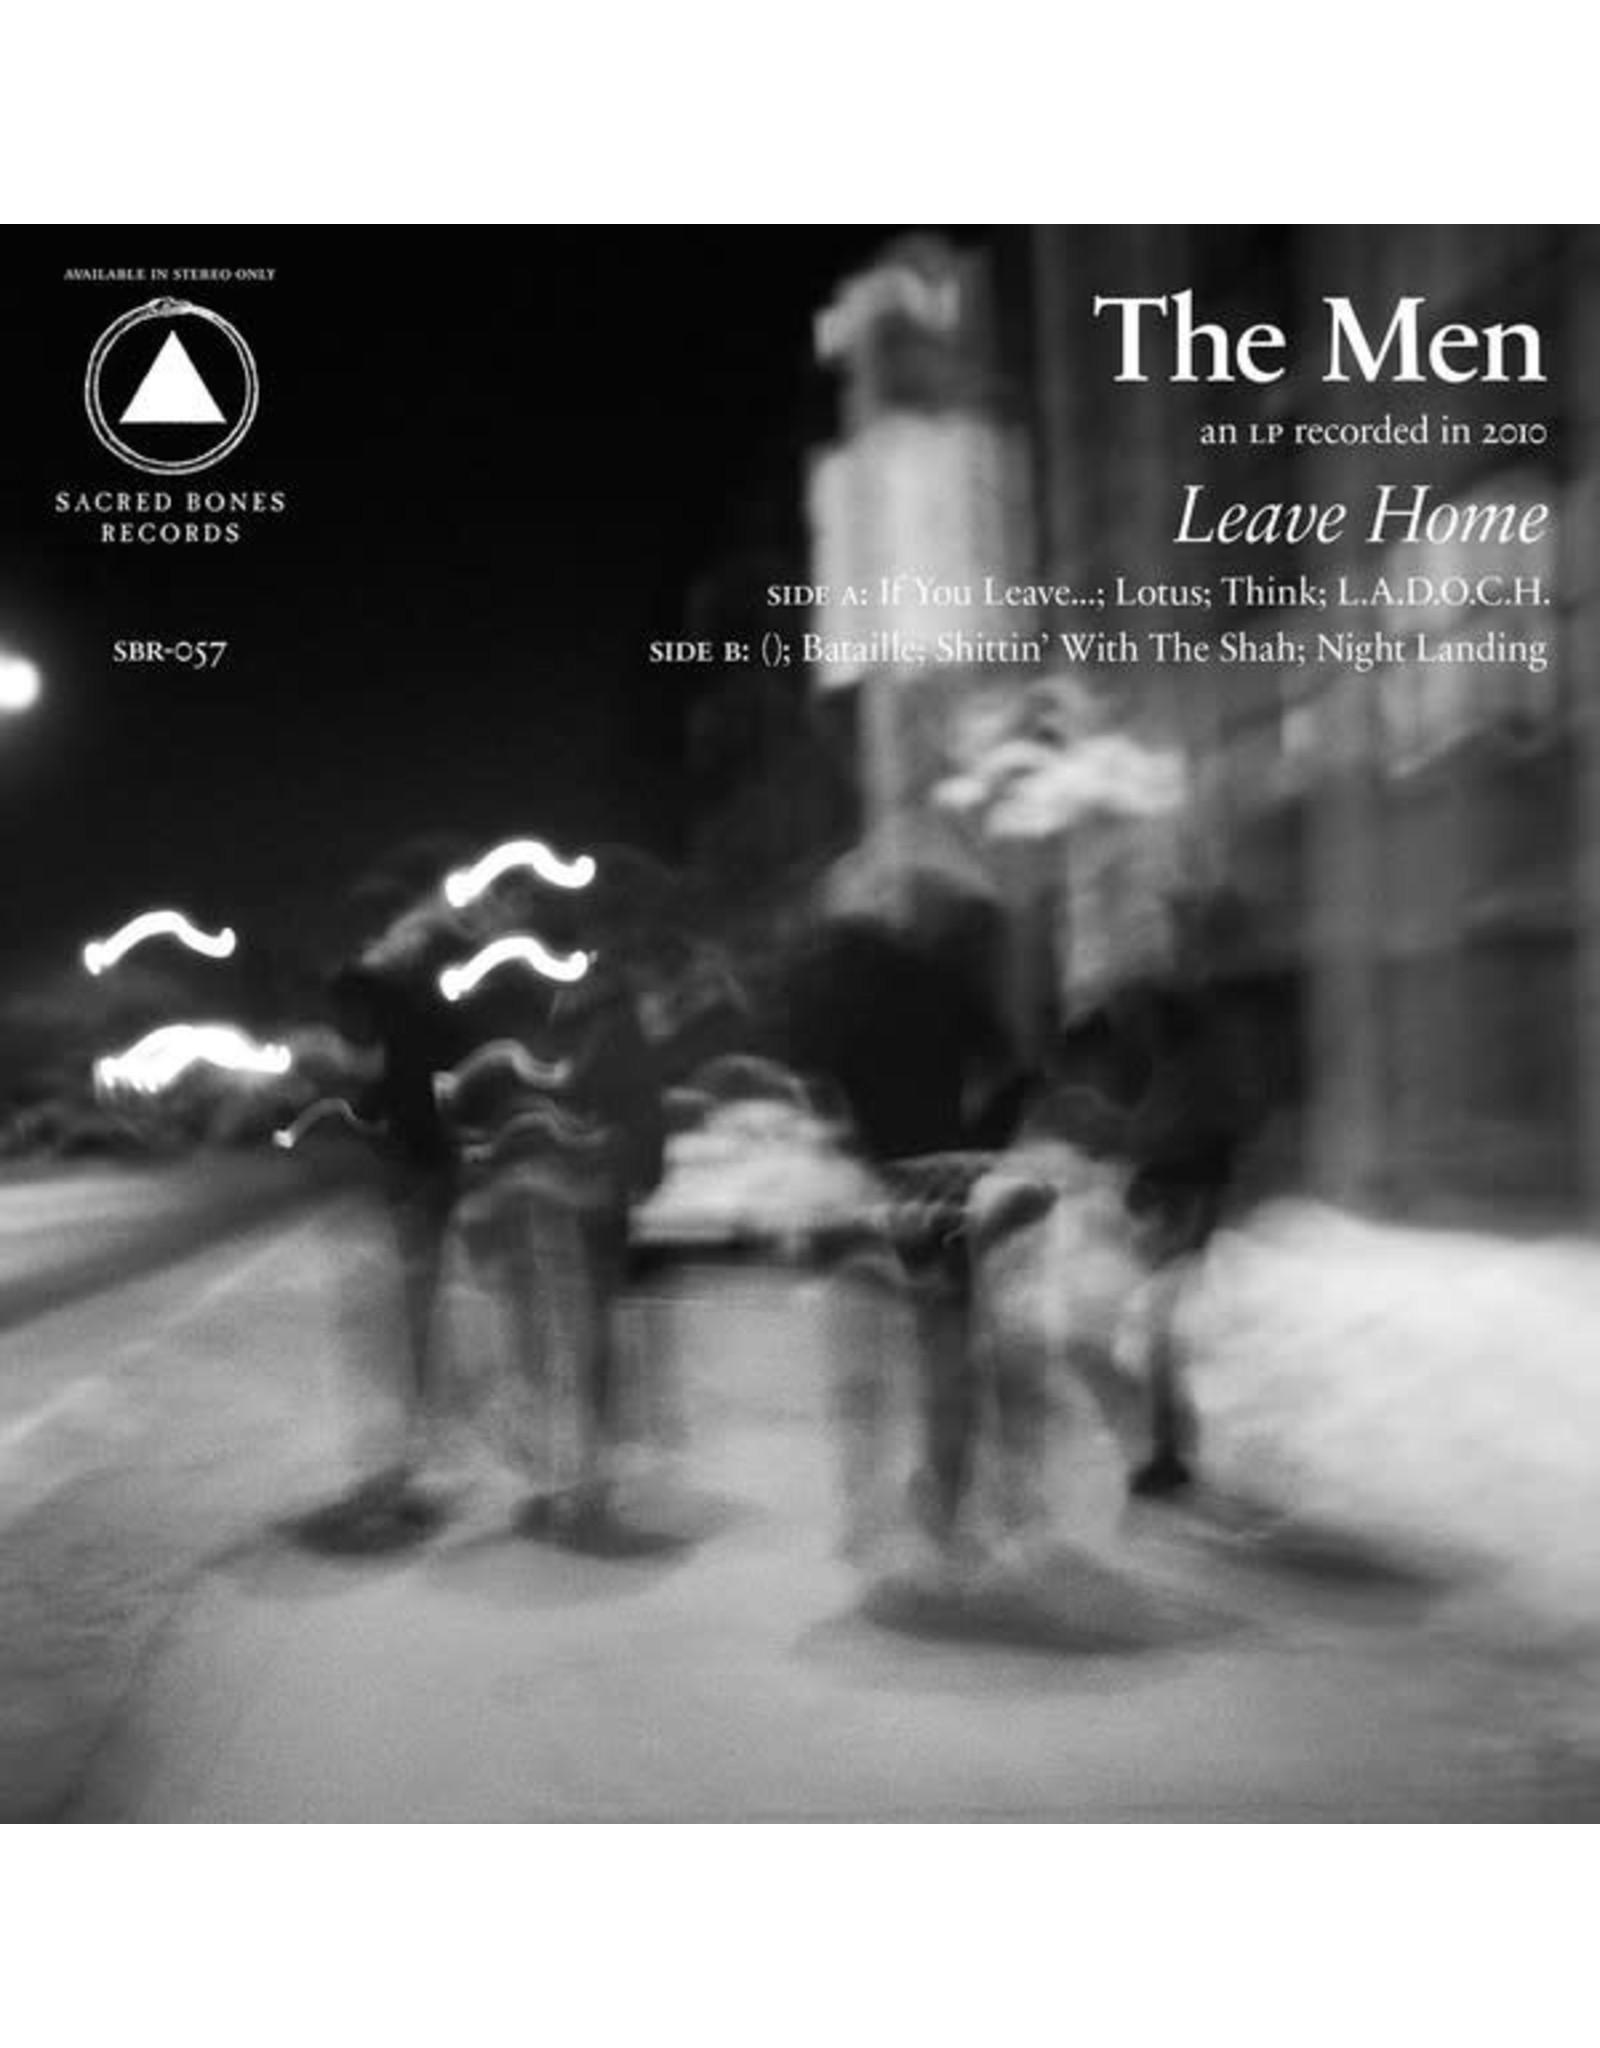 New Vinyl The Men - Leave Home (10th Anniversary, White) LP